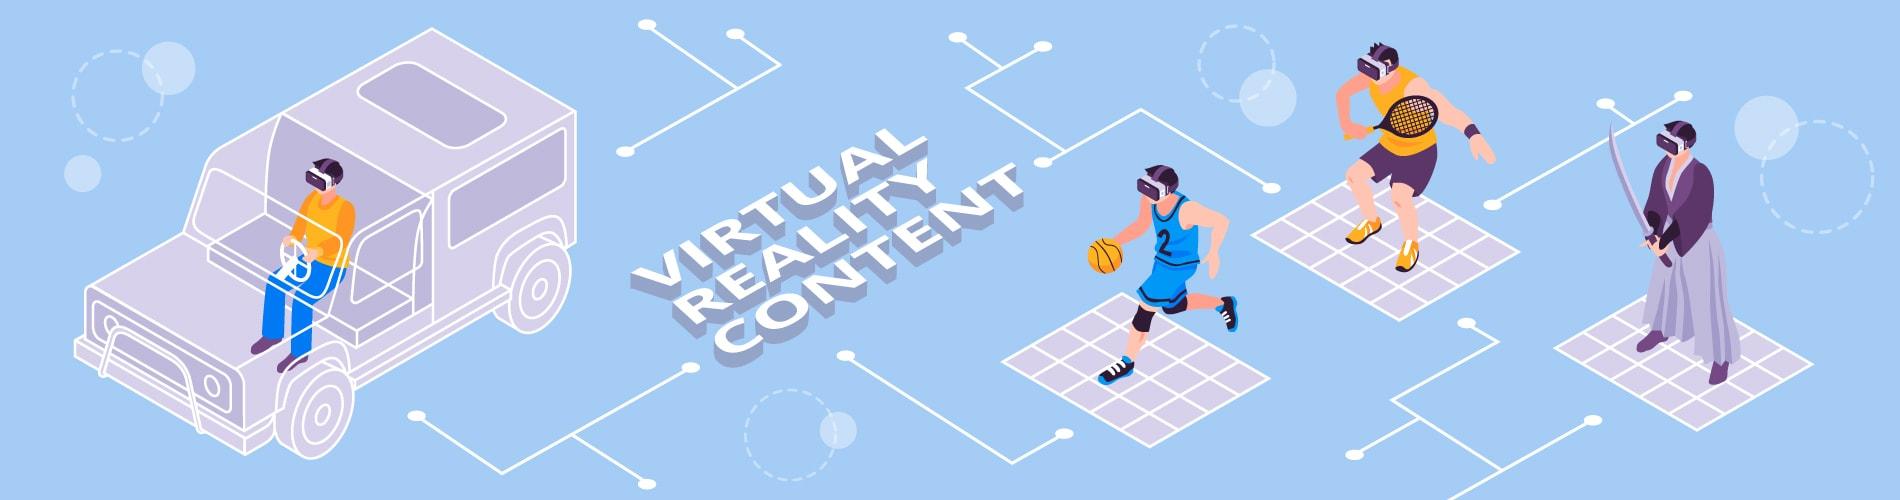 create VR content